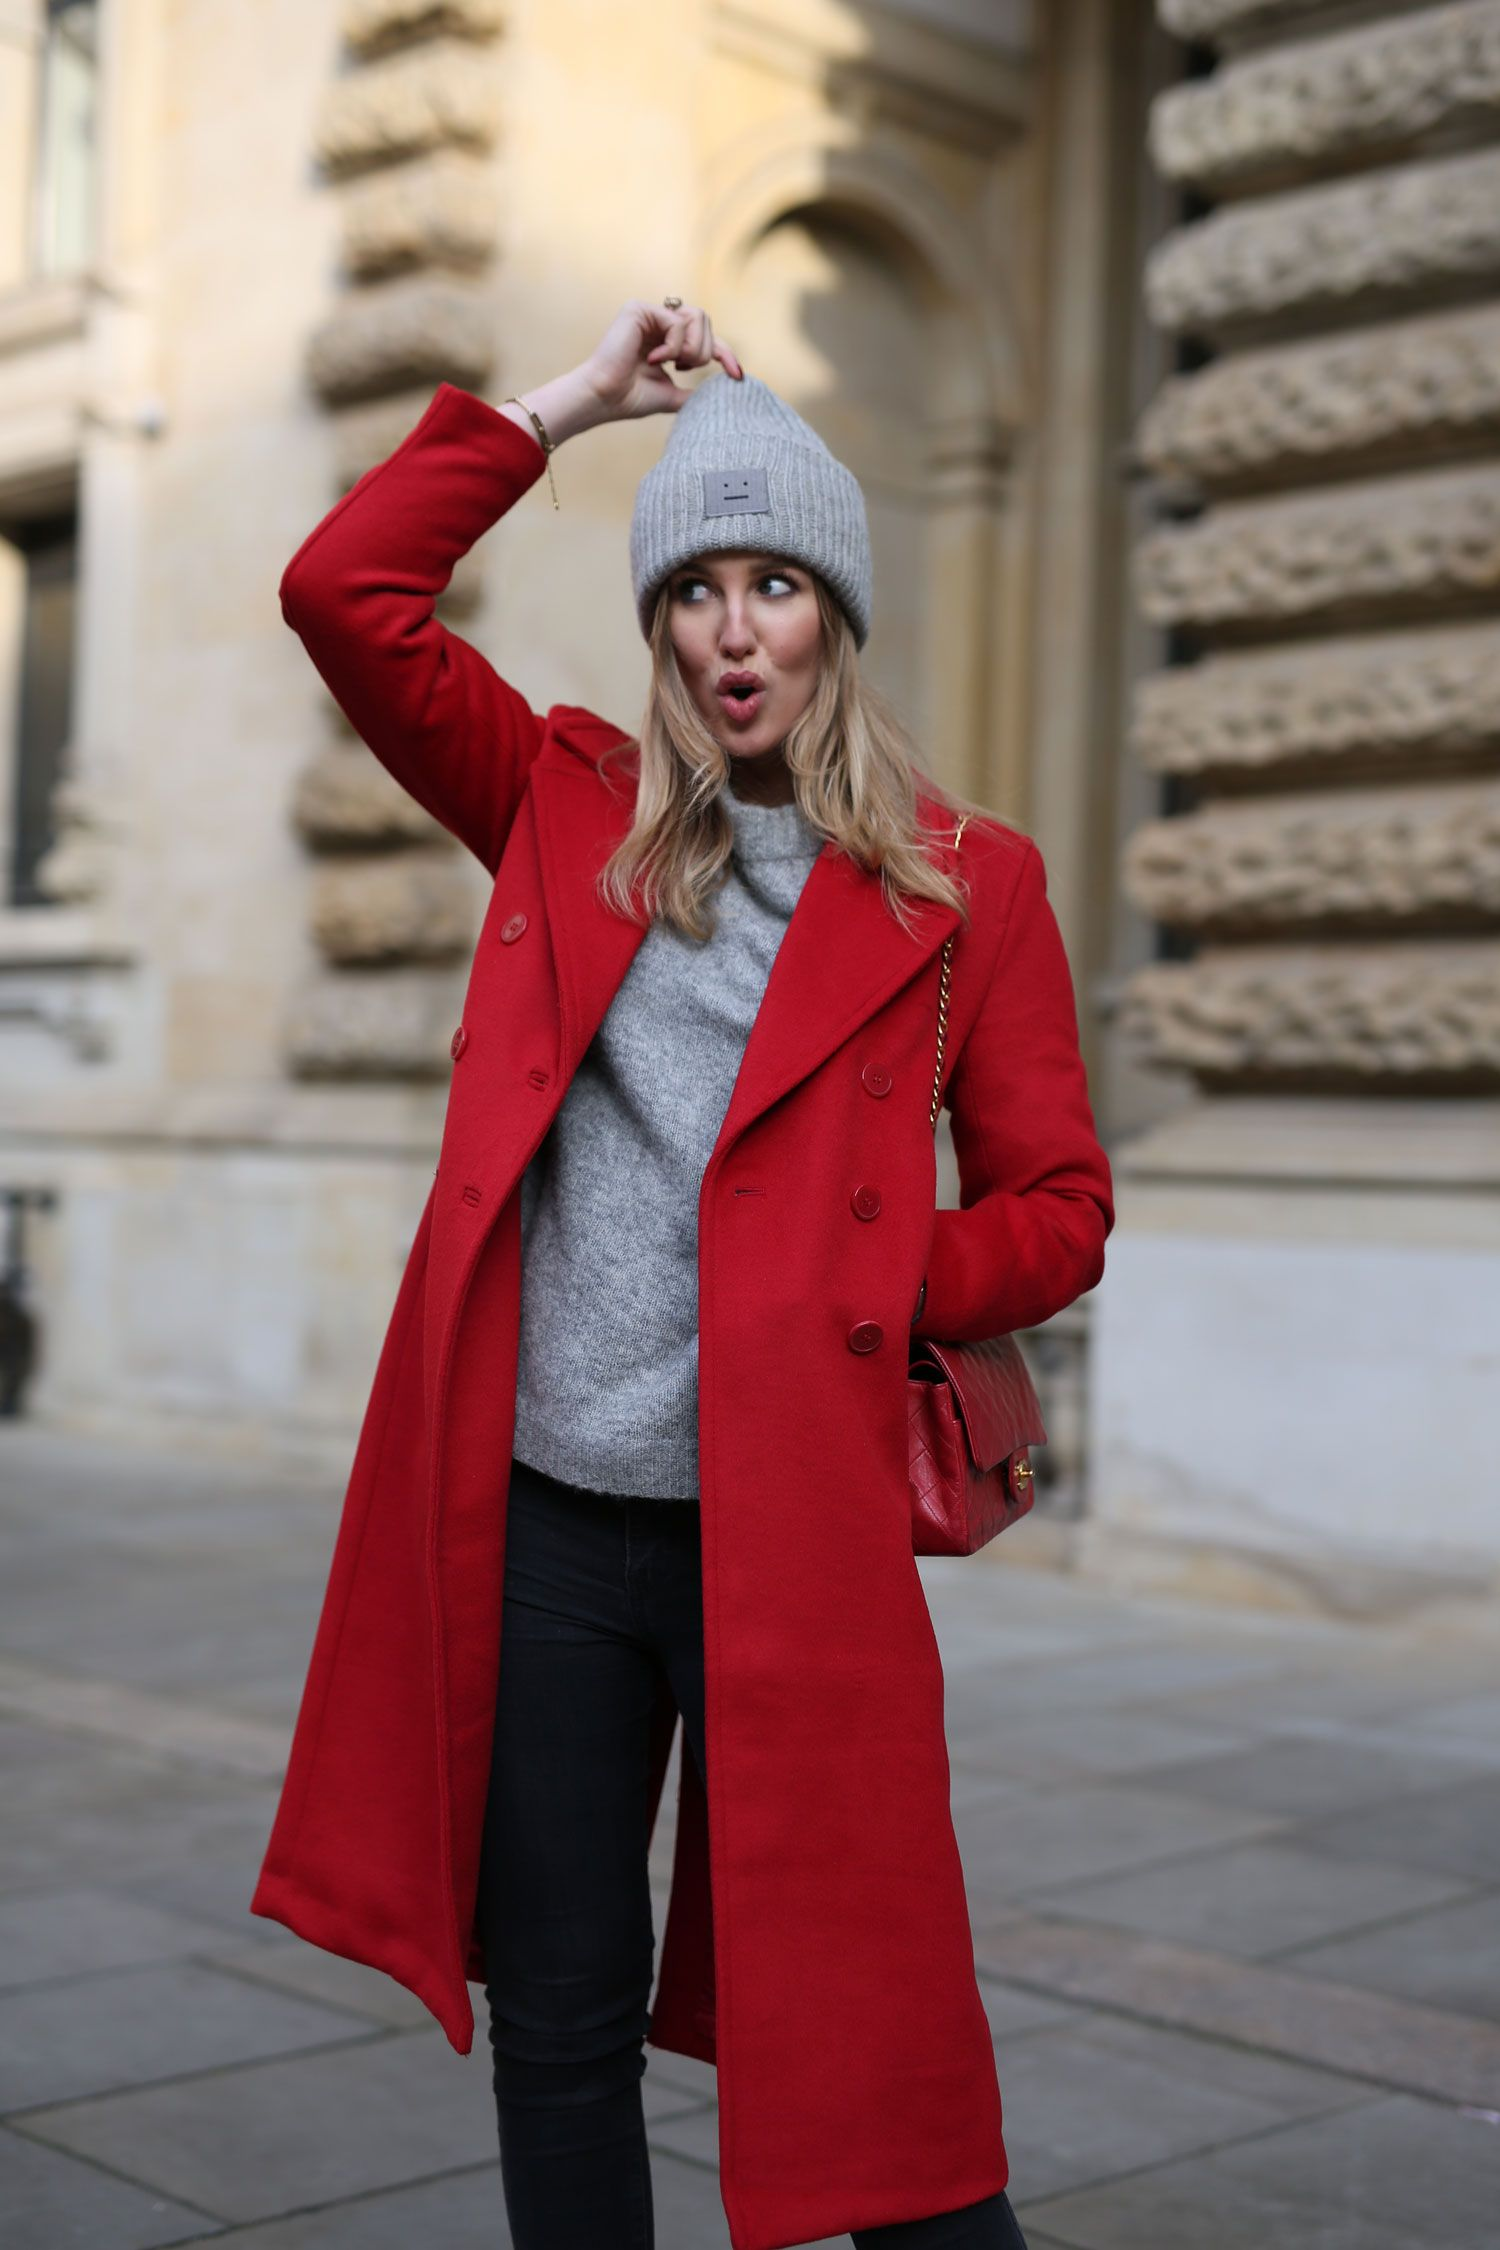 Roter mantel winter